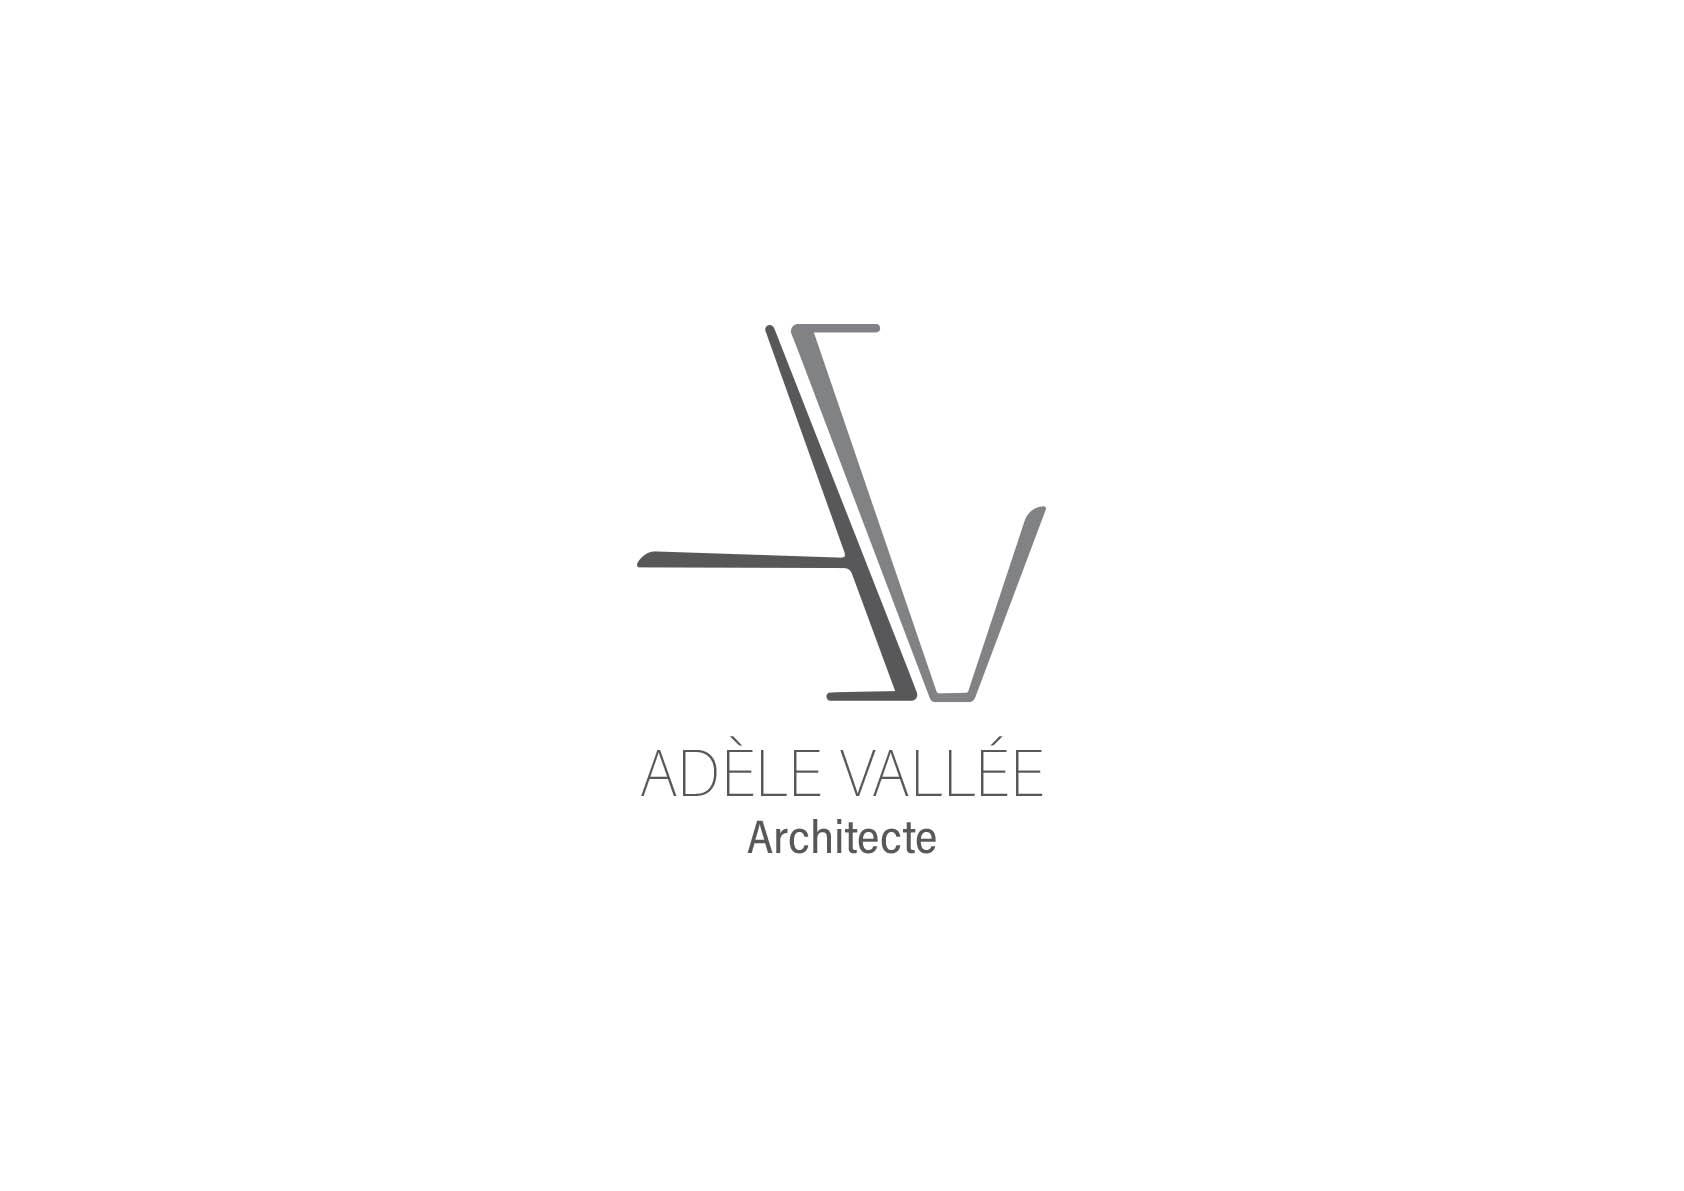 Adele valle architecte maurienne